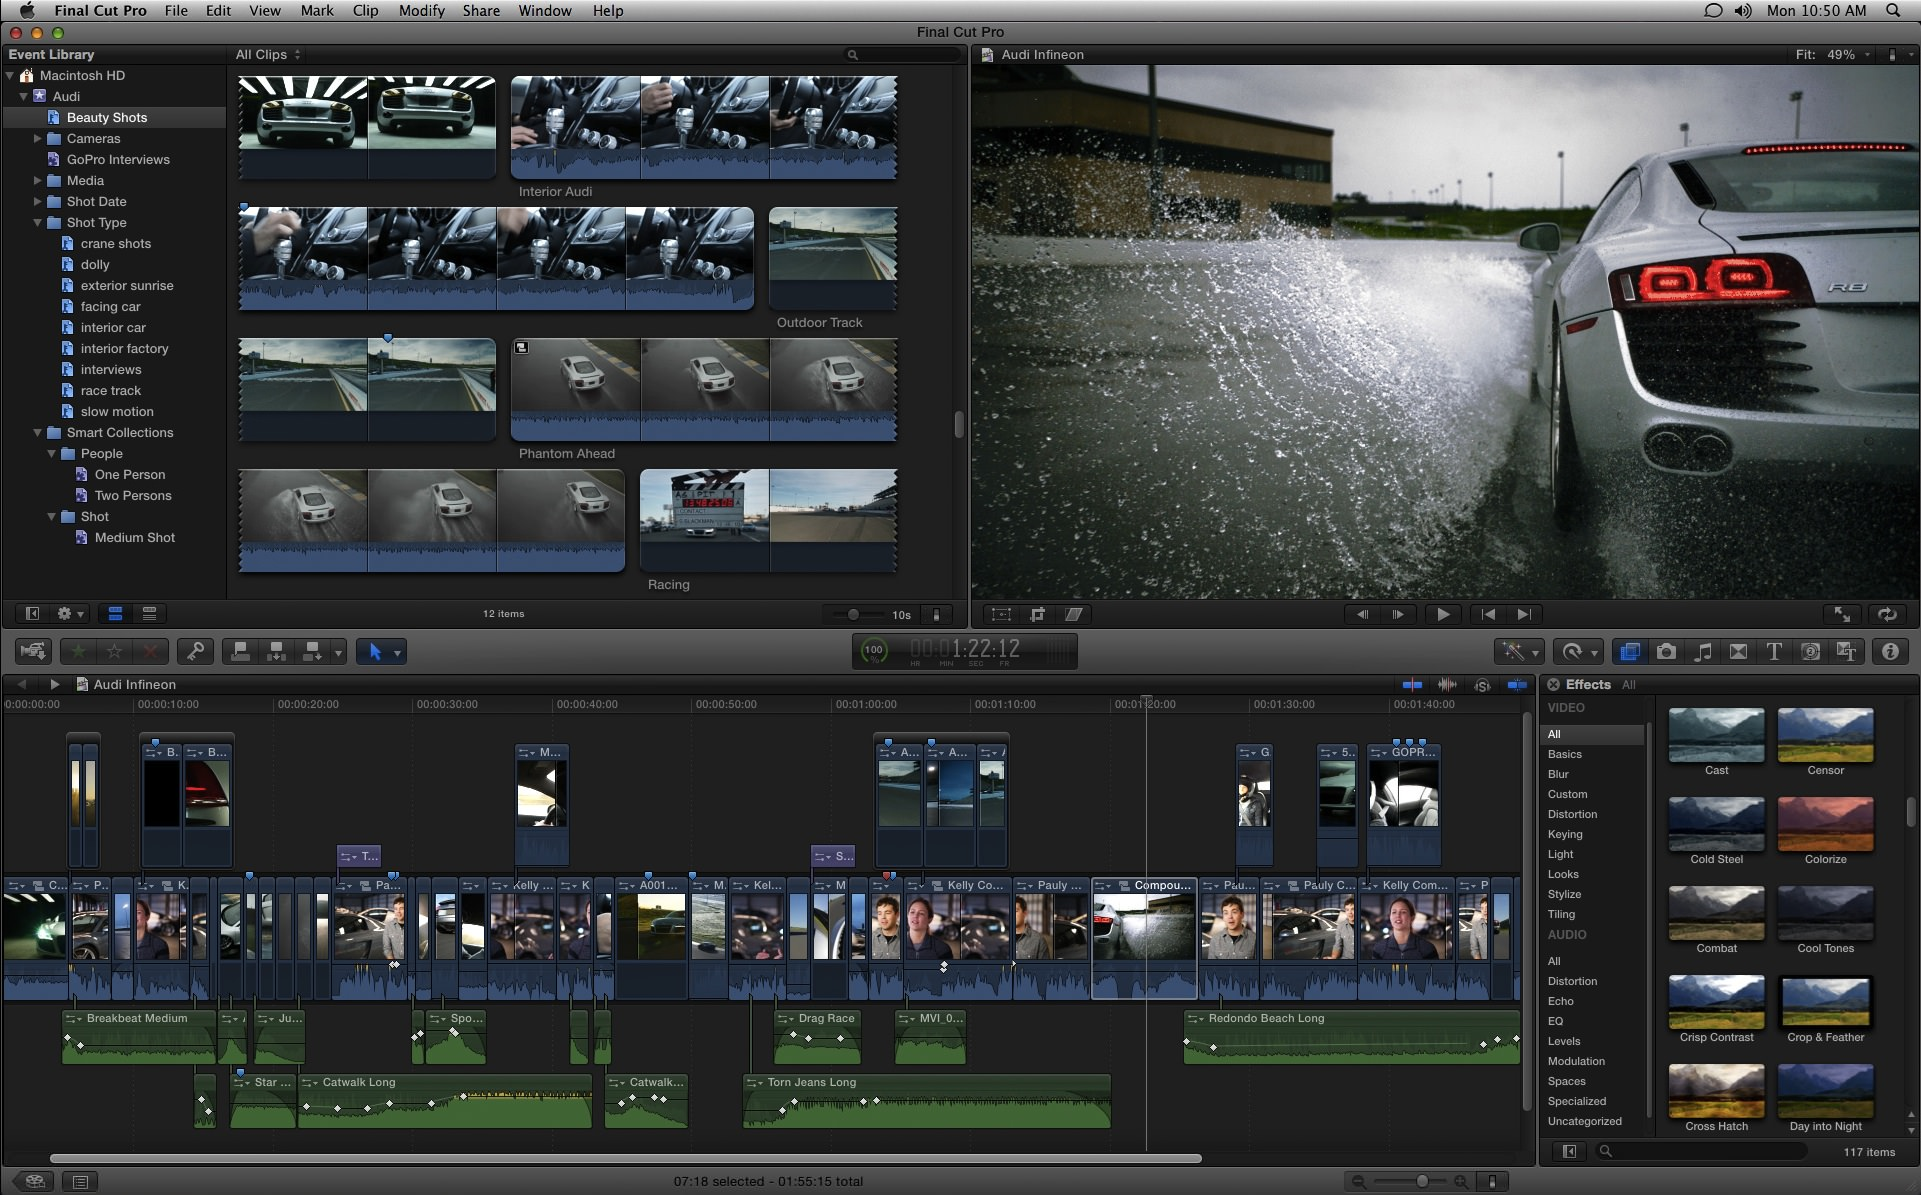 Best photo editing softwares for mac Studio Artist - The best Photo Mosaic software for Mac and Windows